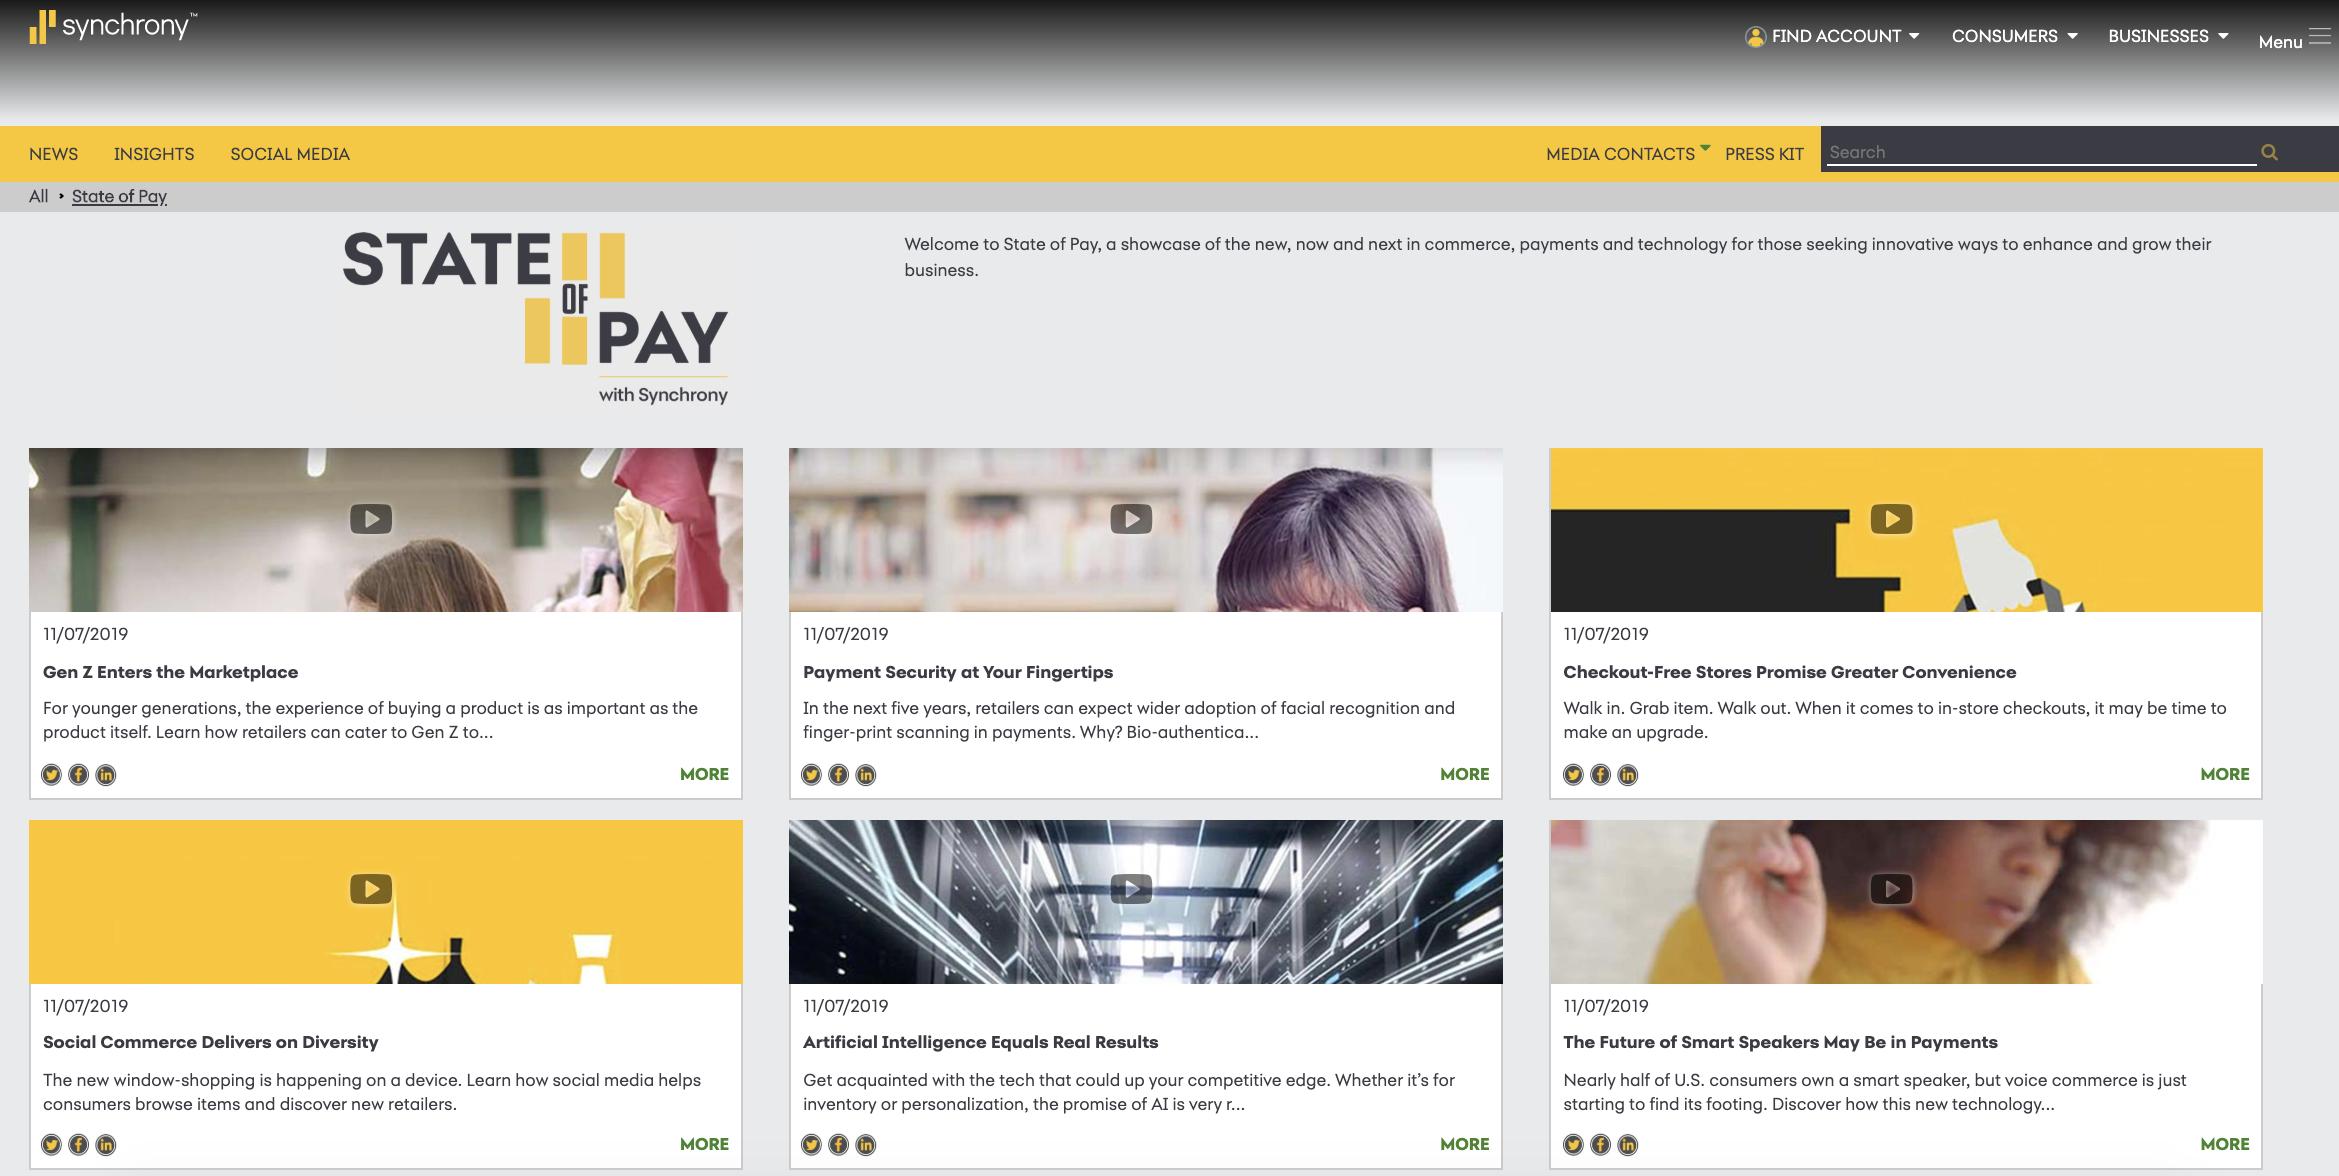 Screenshot of financial services content marketing hub